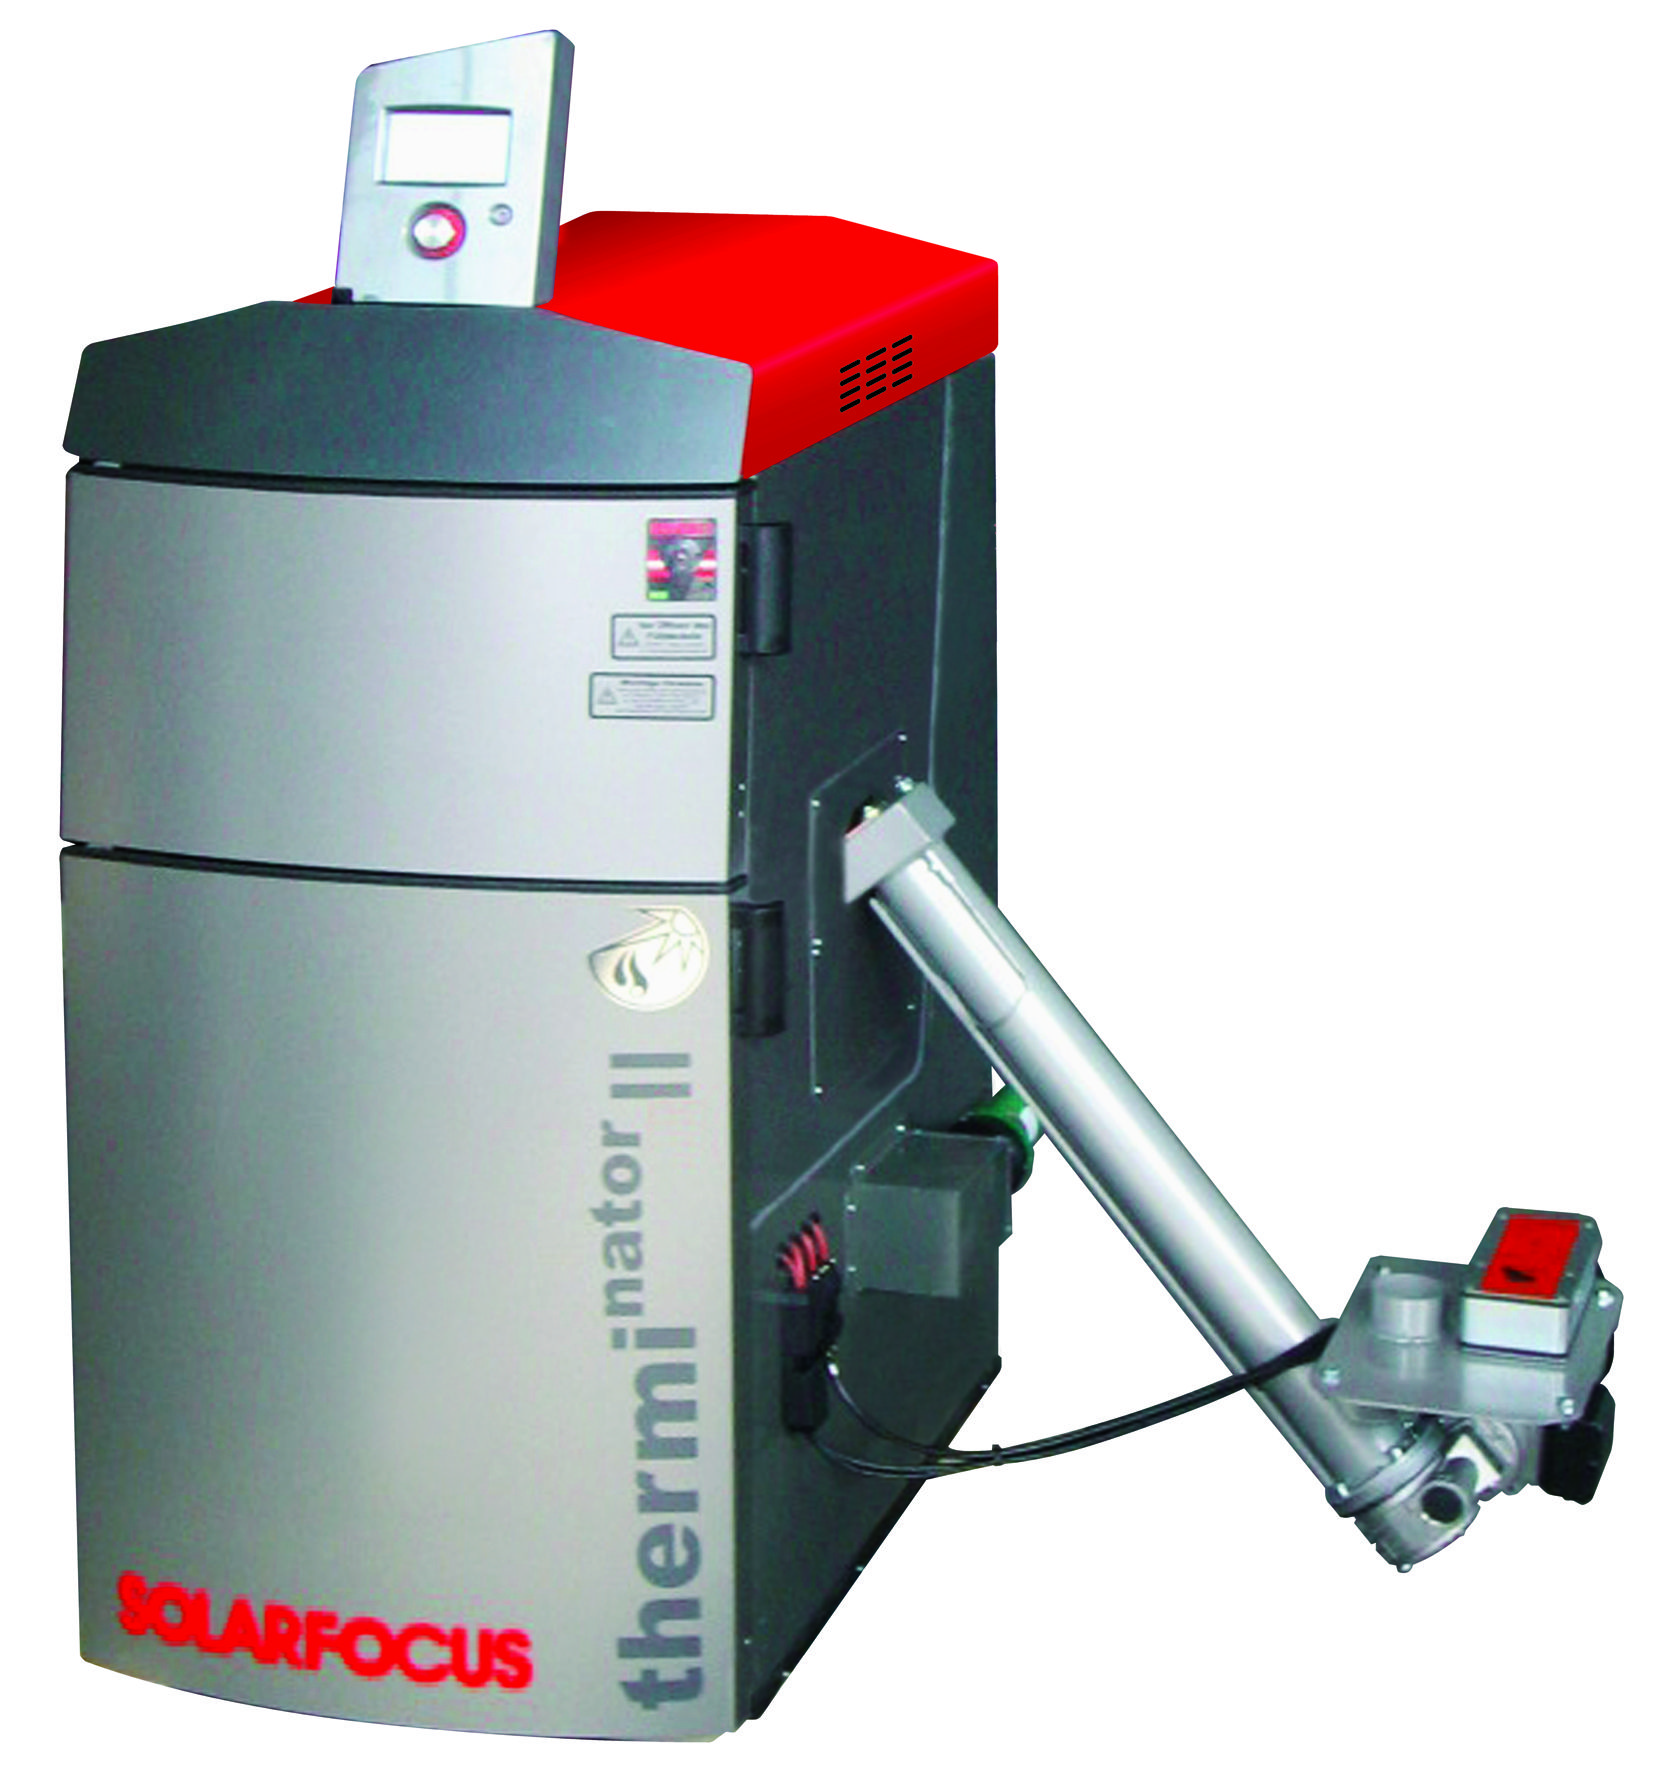 Wood Pellet Boiler | Wood pellet boiler, Wood pellets ...